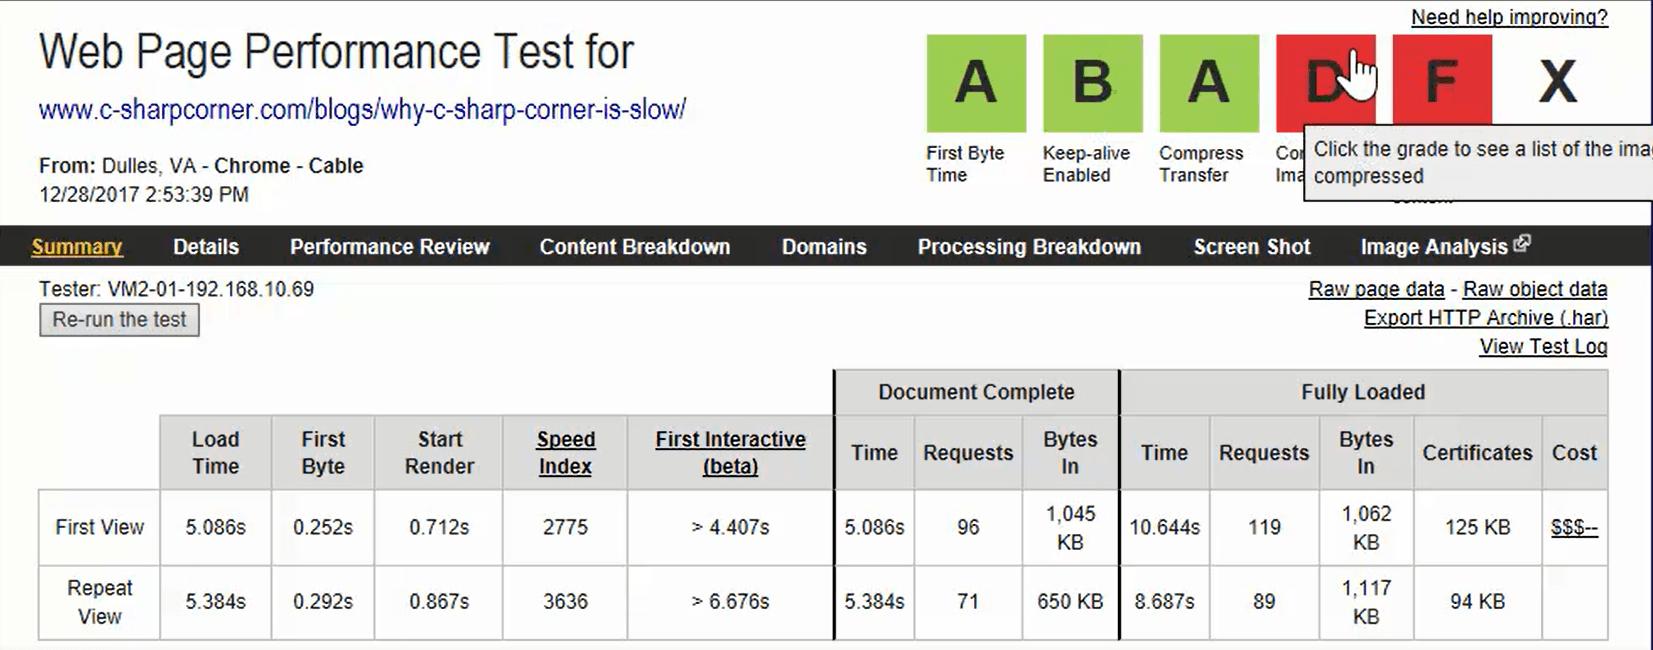 csharp-corner-dulles-test-report-card